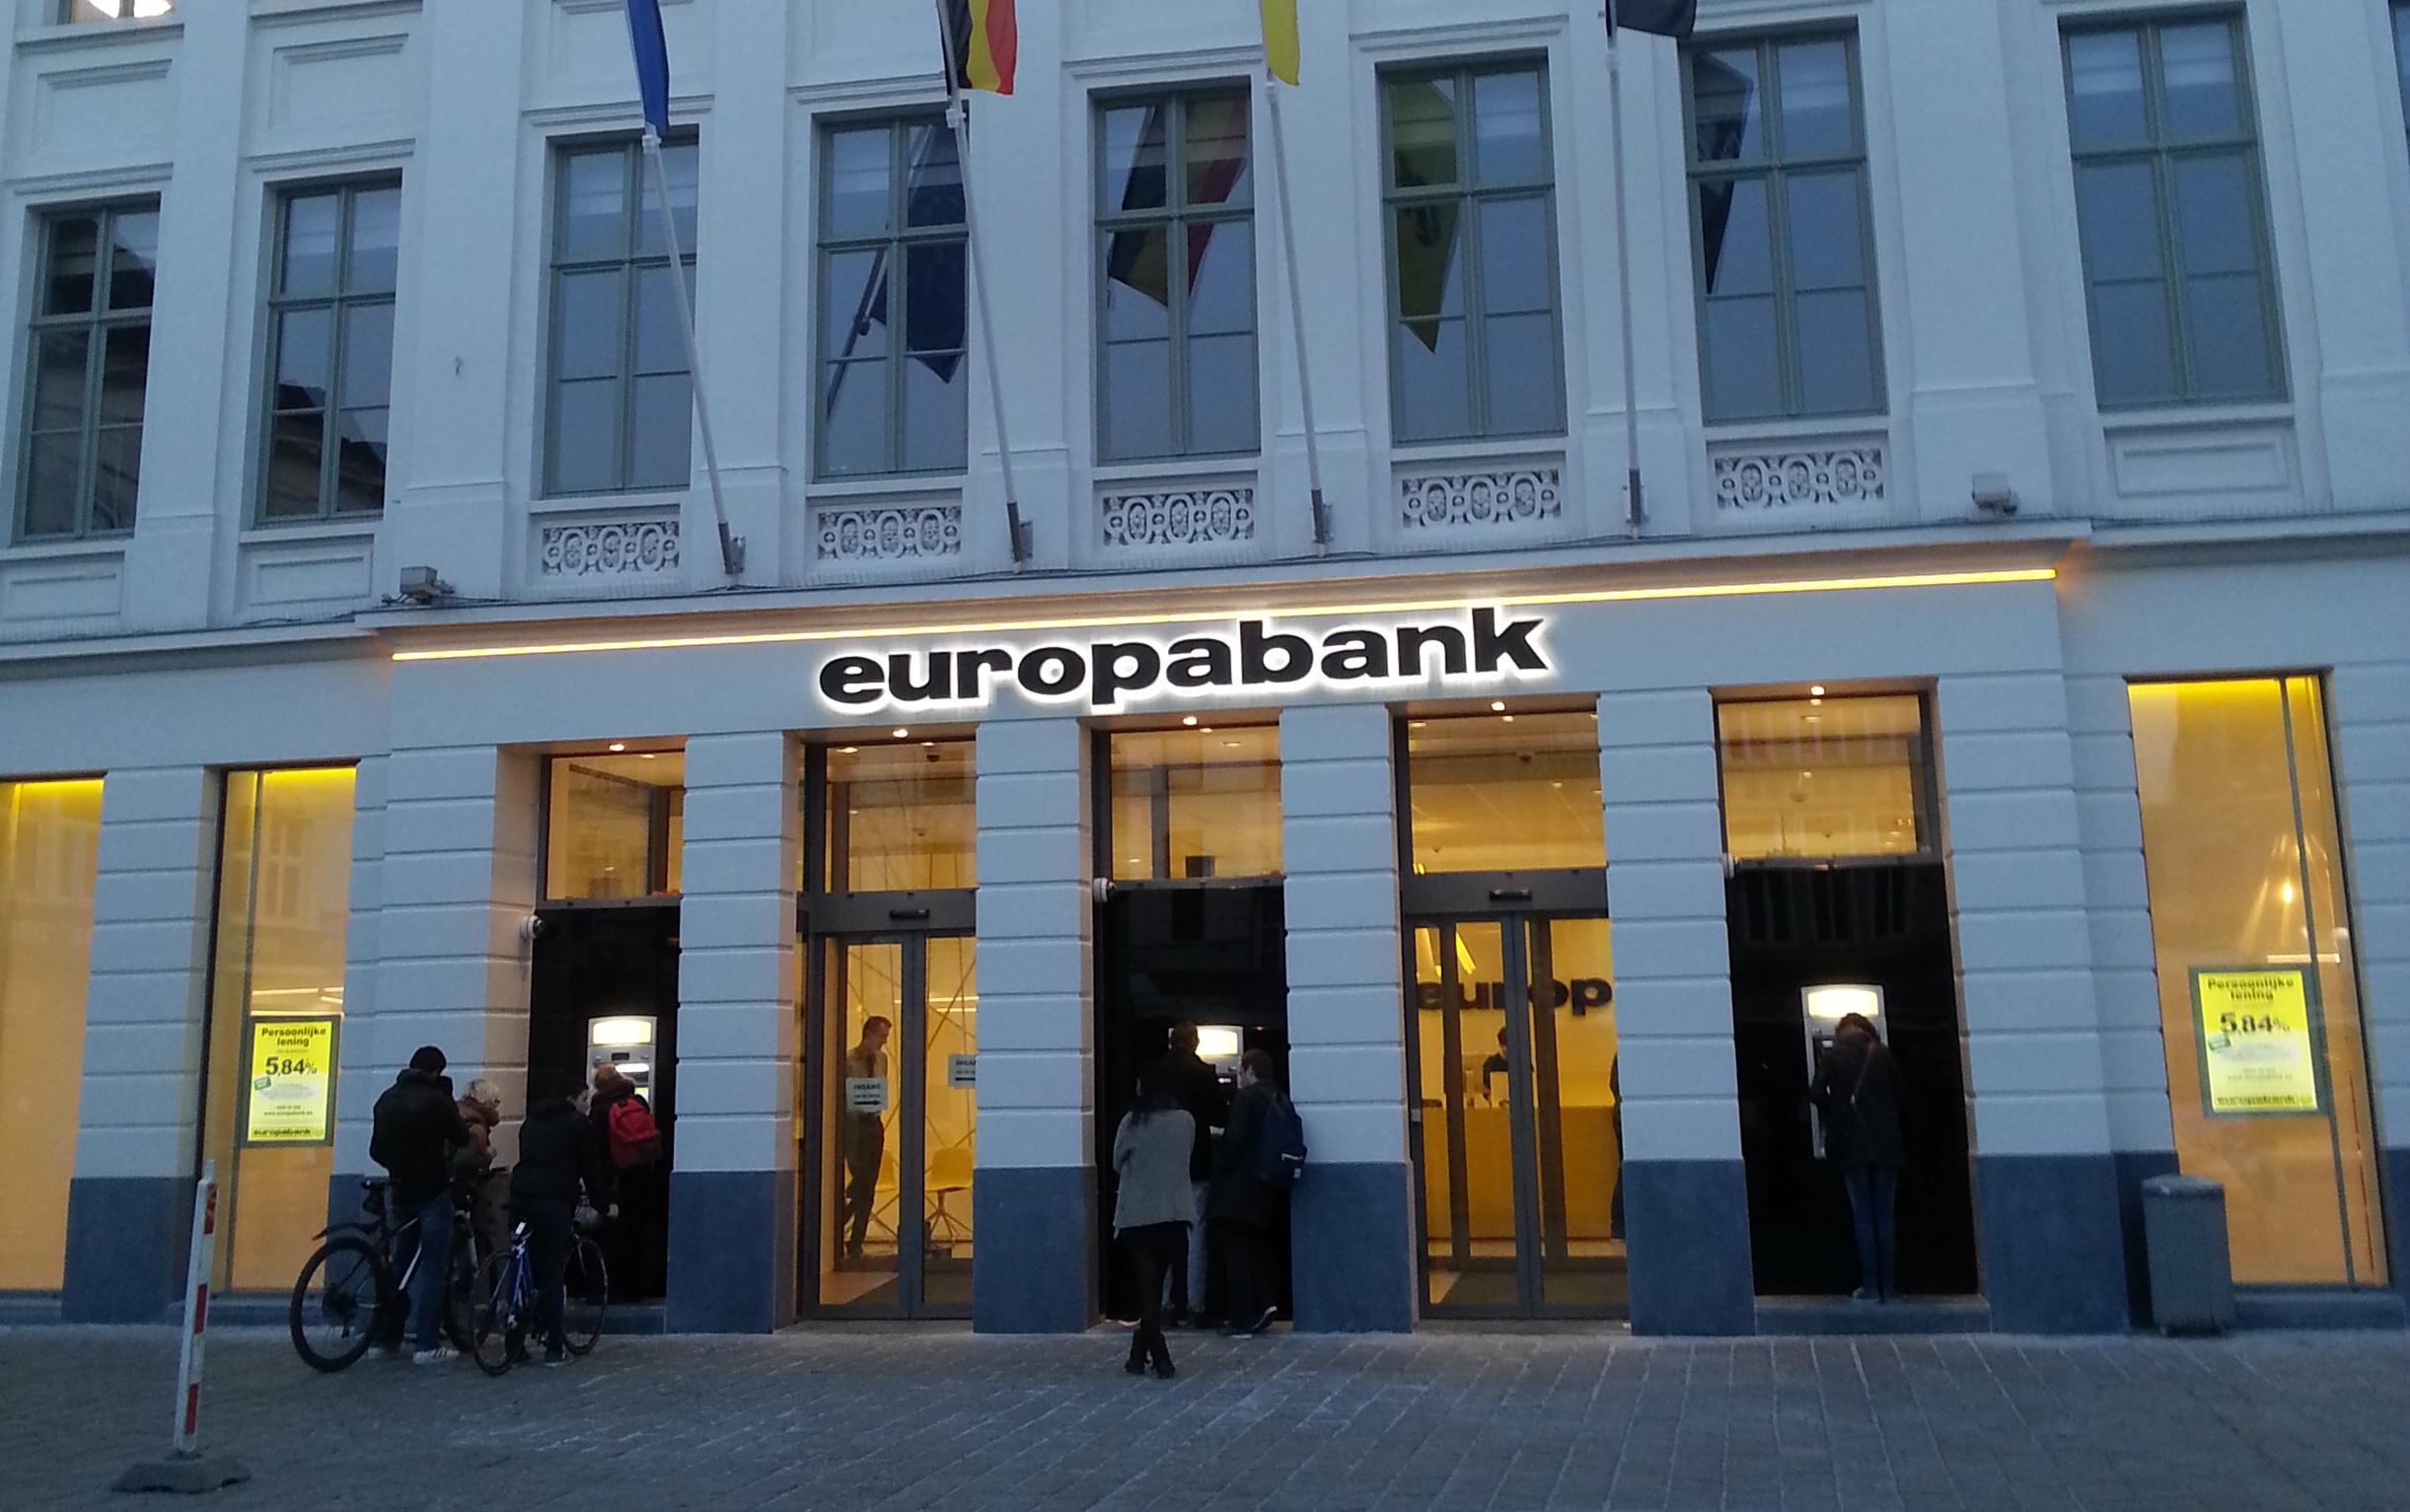 Europabank Gent